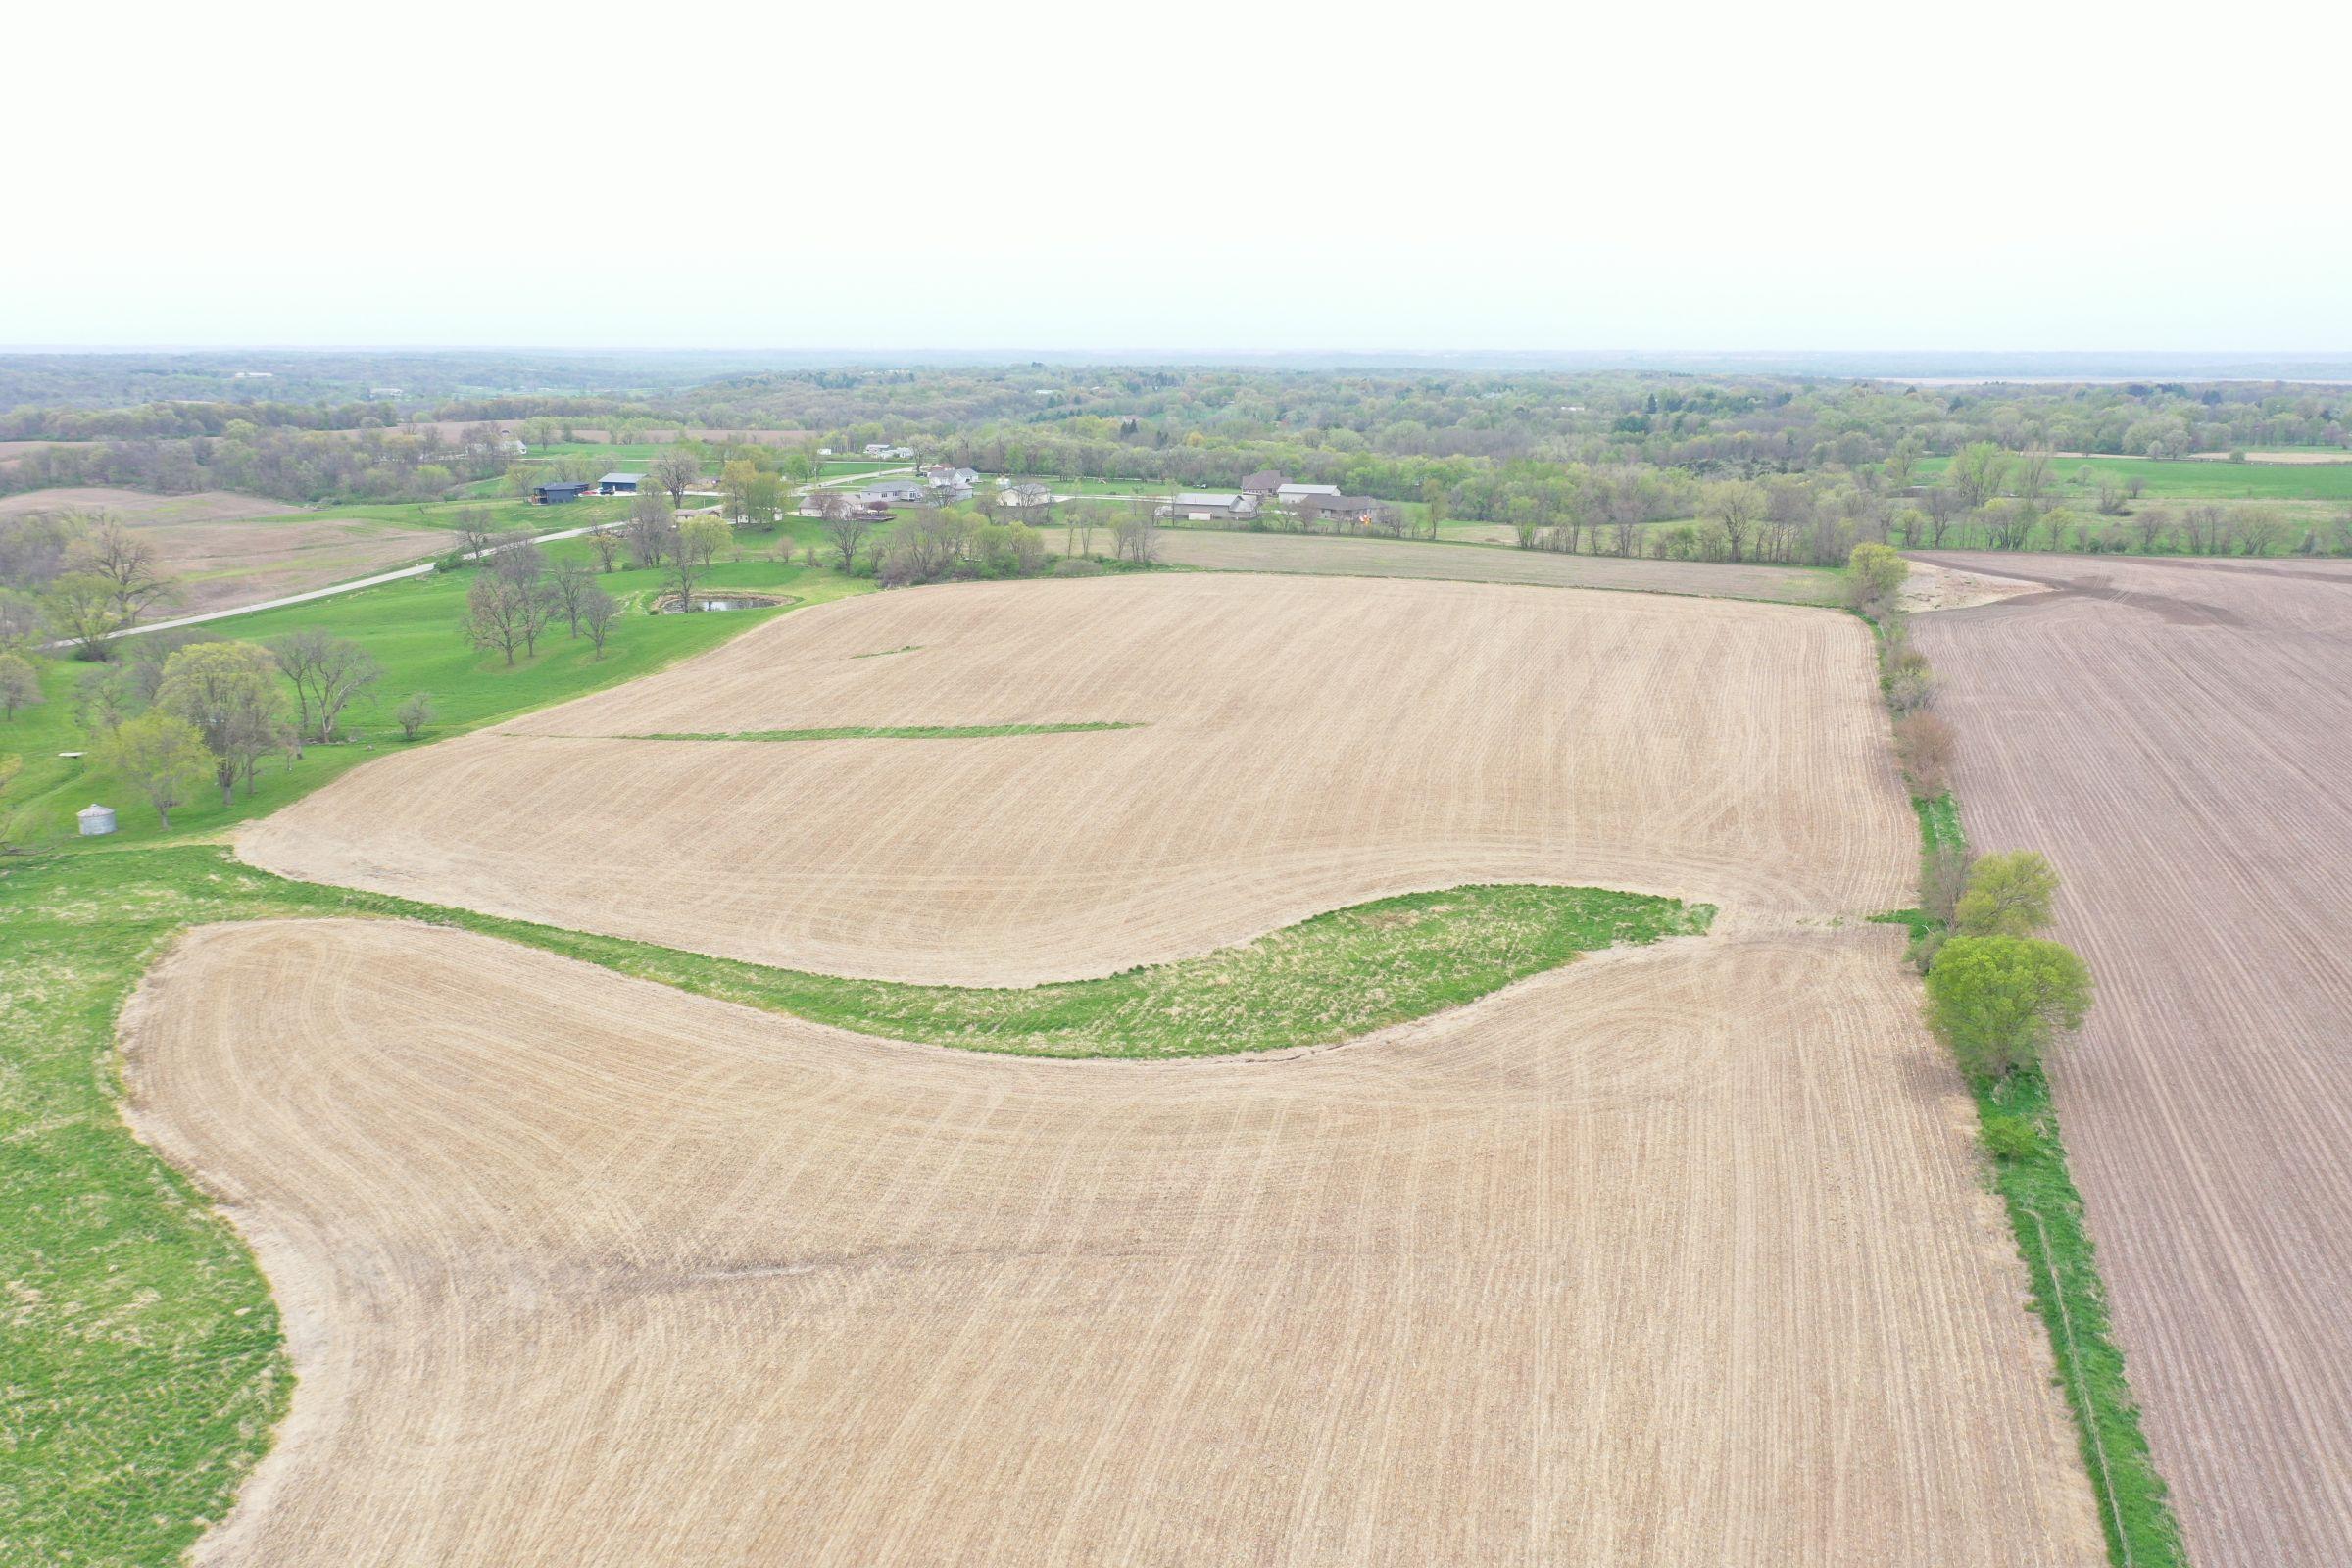 residential-polk-county-iowa-34-acres-listing-number-15502-0-2021-04-29-143440.JPG